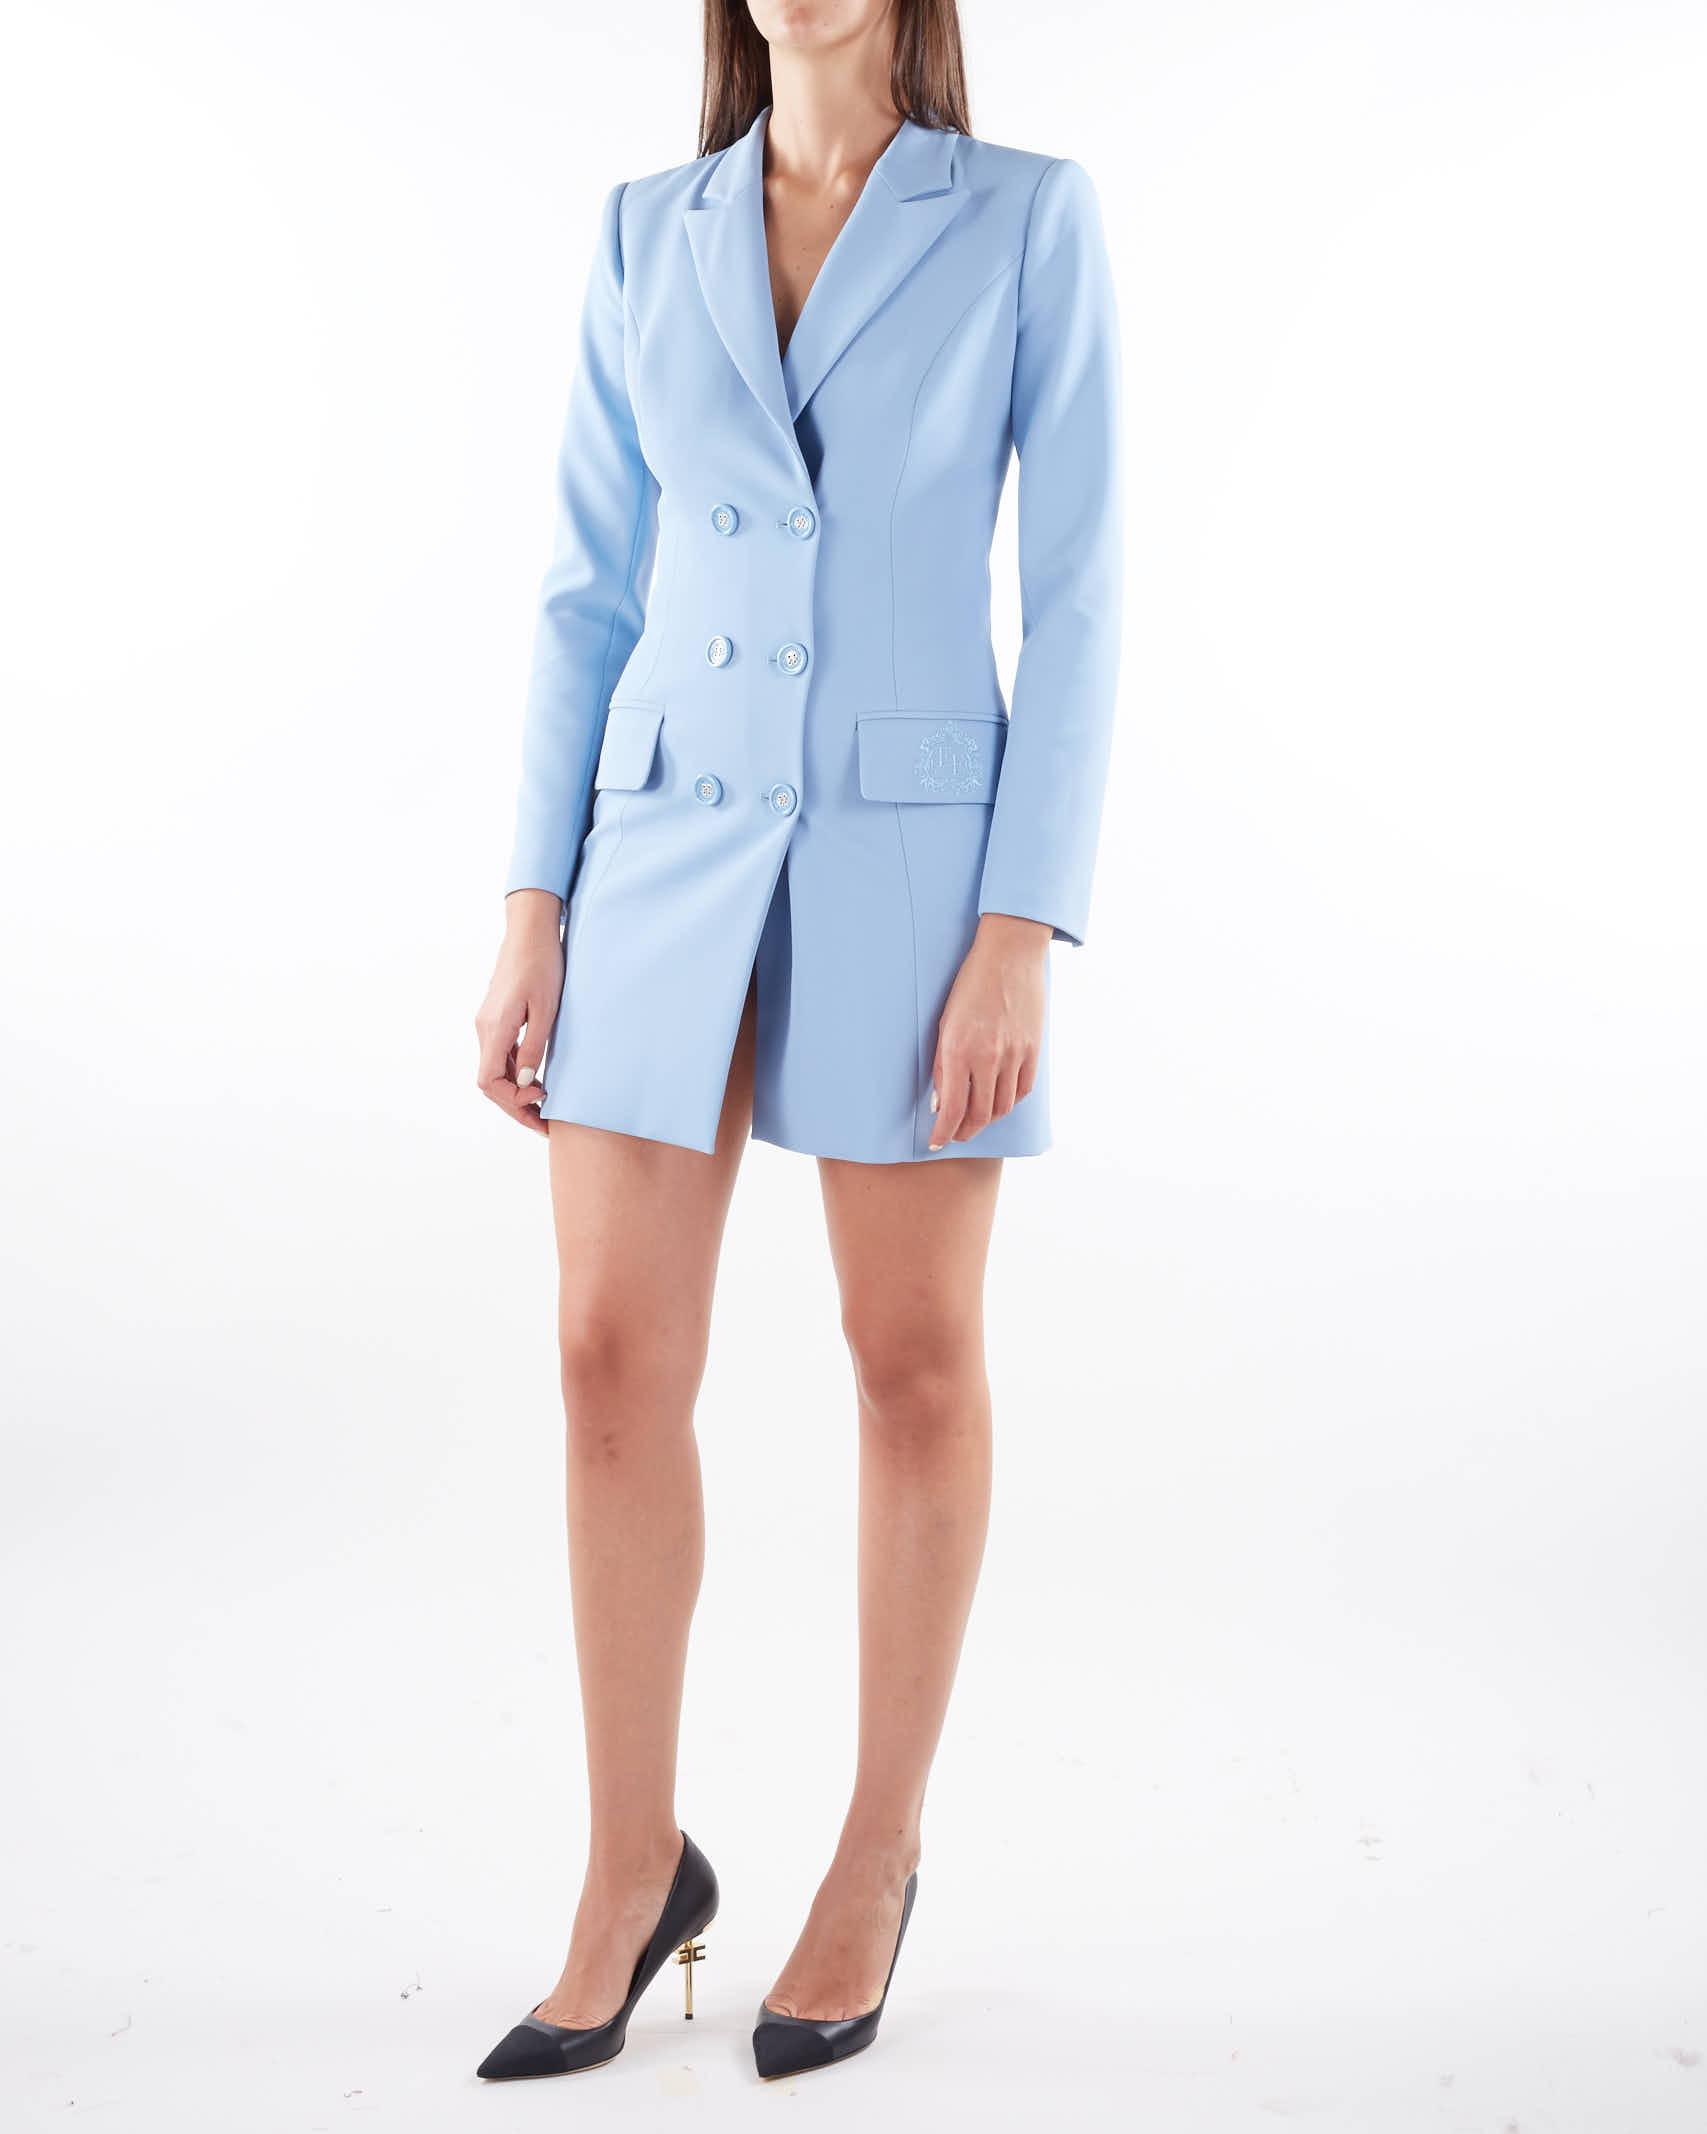 Robe manteau con stemma ricamato EF Elisabetta Franchi ELISABETTA FRANCHI   Abito   AB08916E2Q80